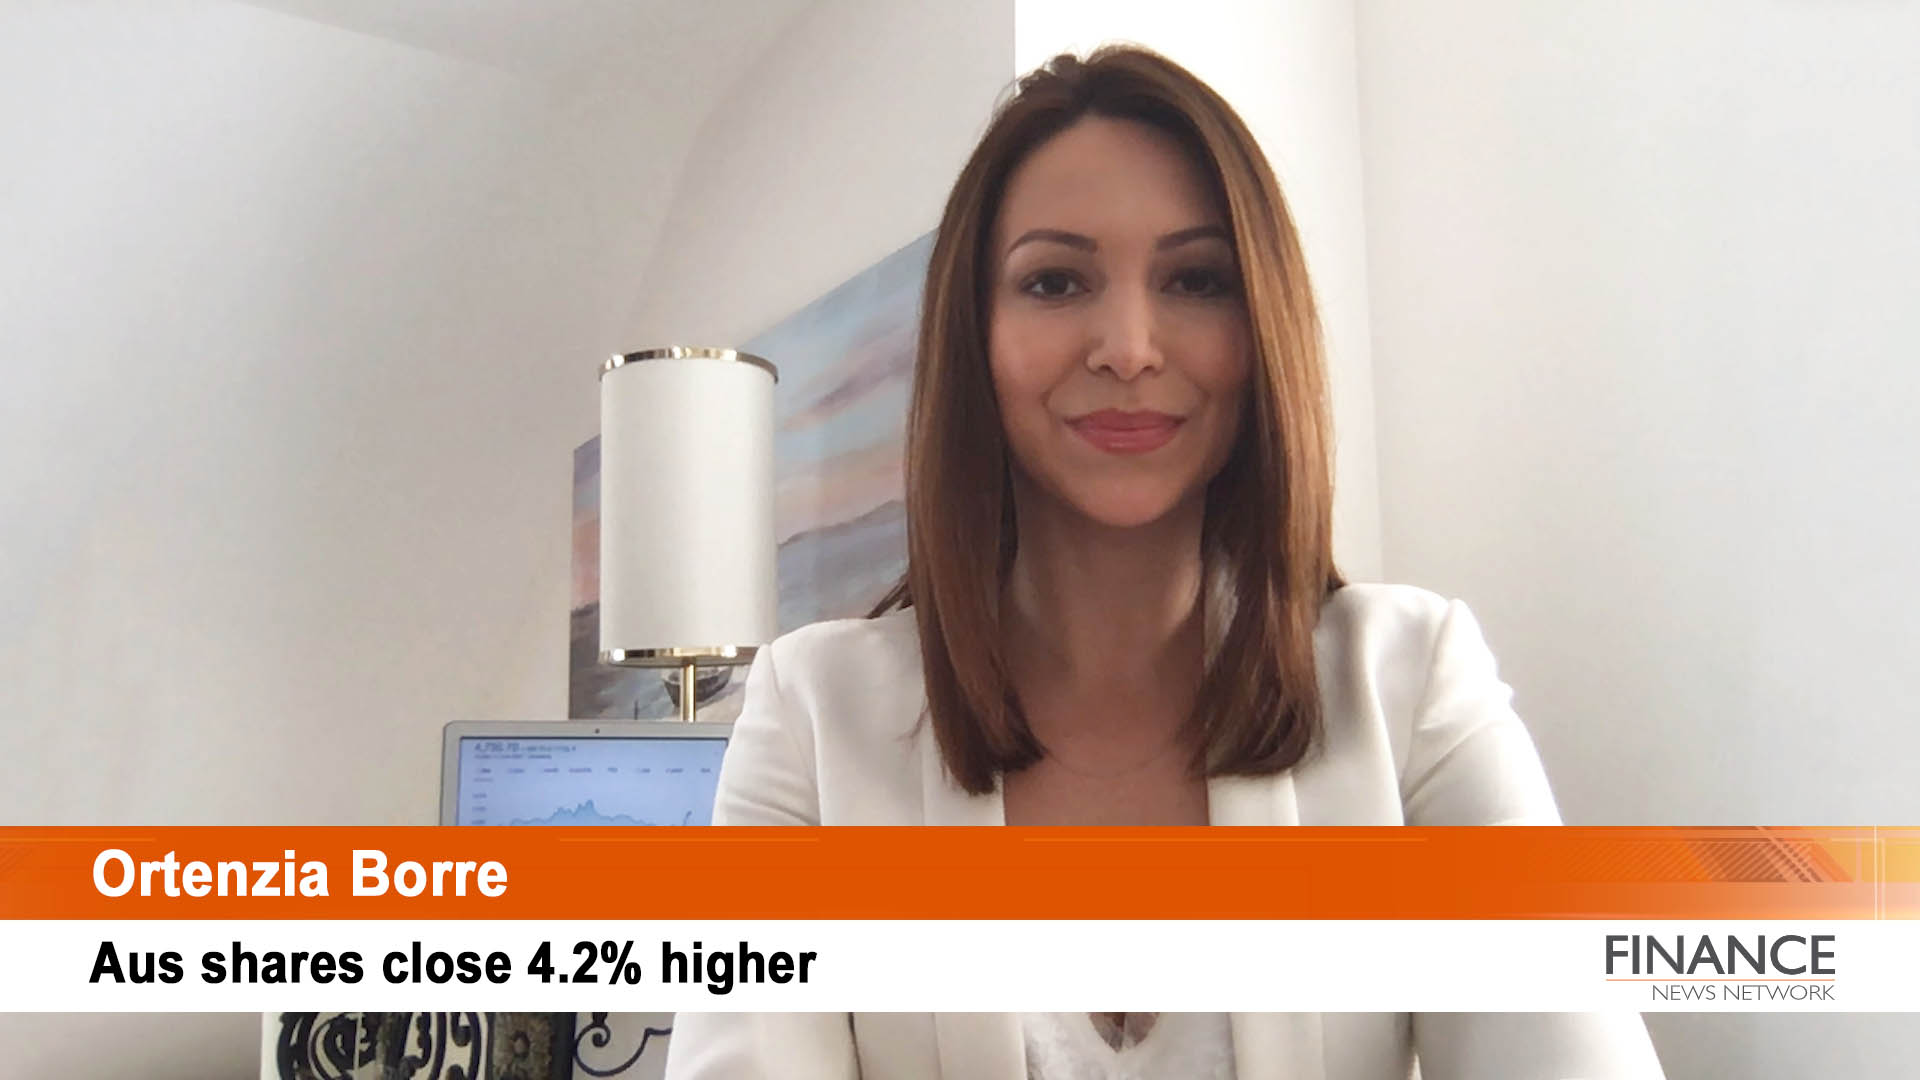 GrainCorp (ASX:GNC) plummets almost 60%: Aus shares close 4.2% higher